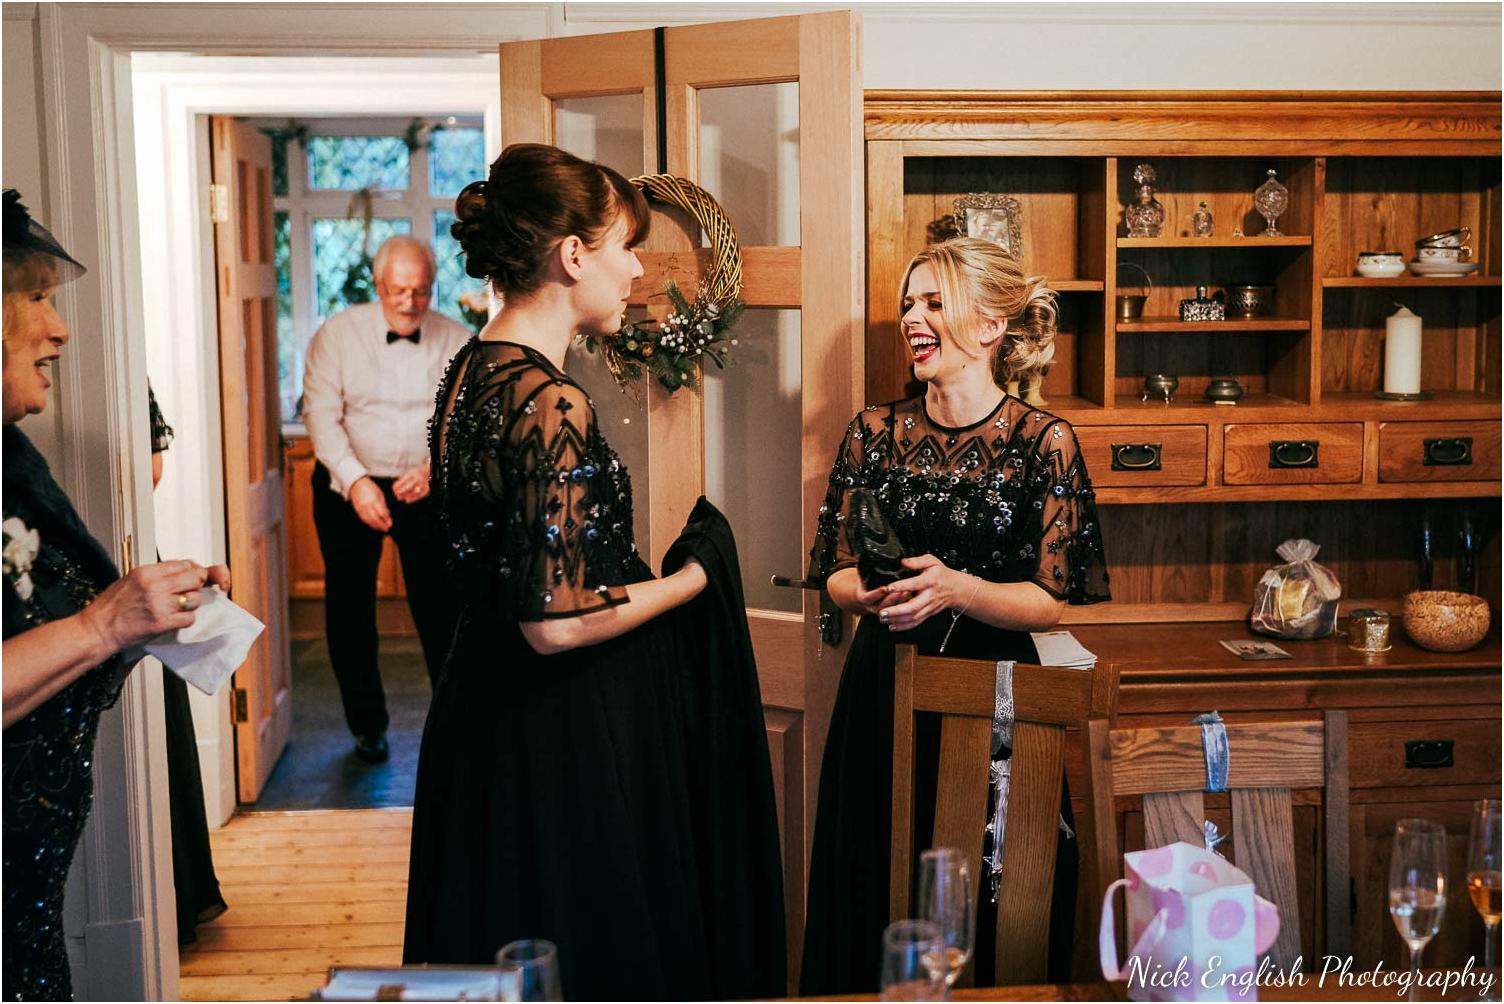 Mitton_Hall_Christmas_Winter_Wedding-15.jpg